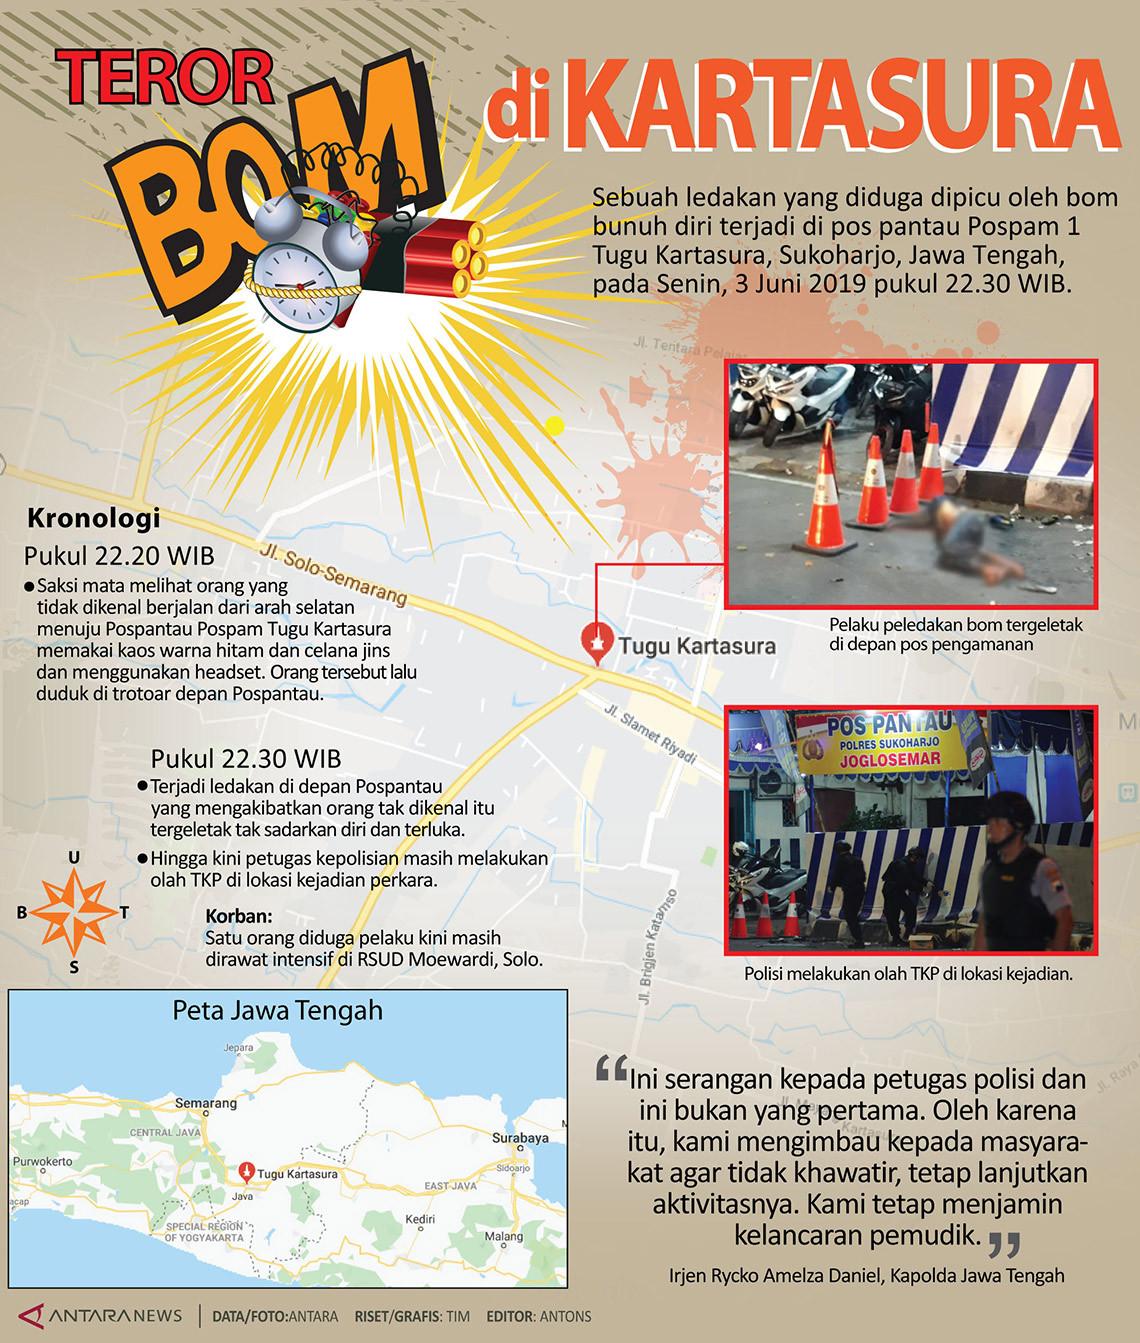 Ledakan bom di Kartasura